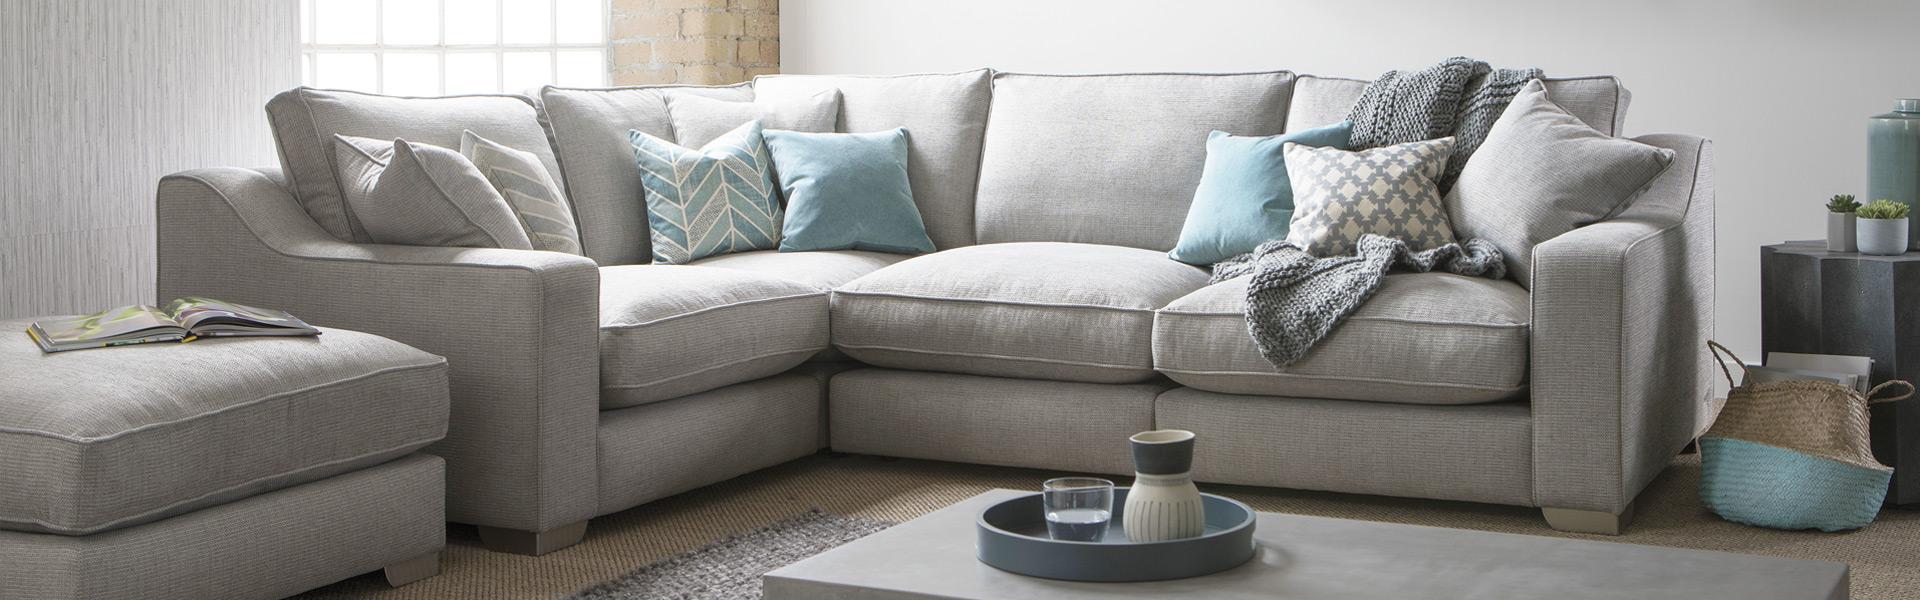 Imogen modular sofa